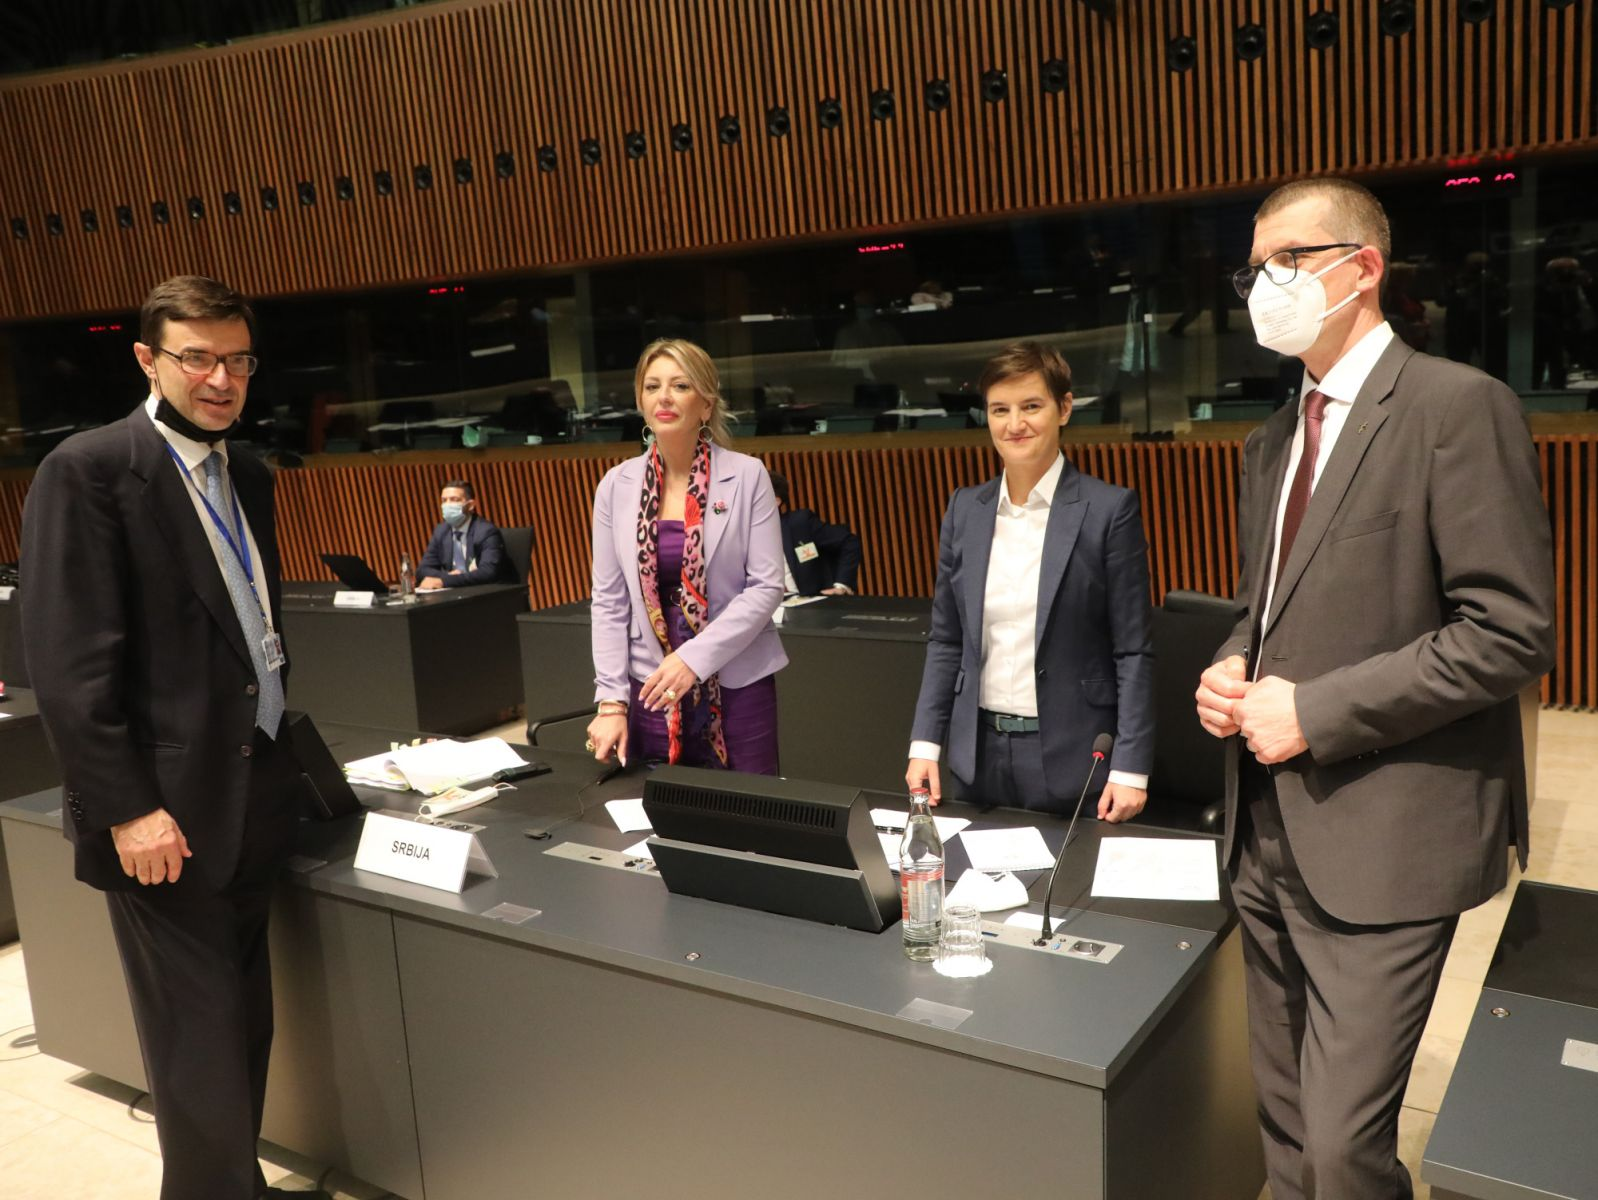 J. Joksimović: Faster pace necessary for credibility of process